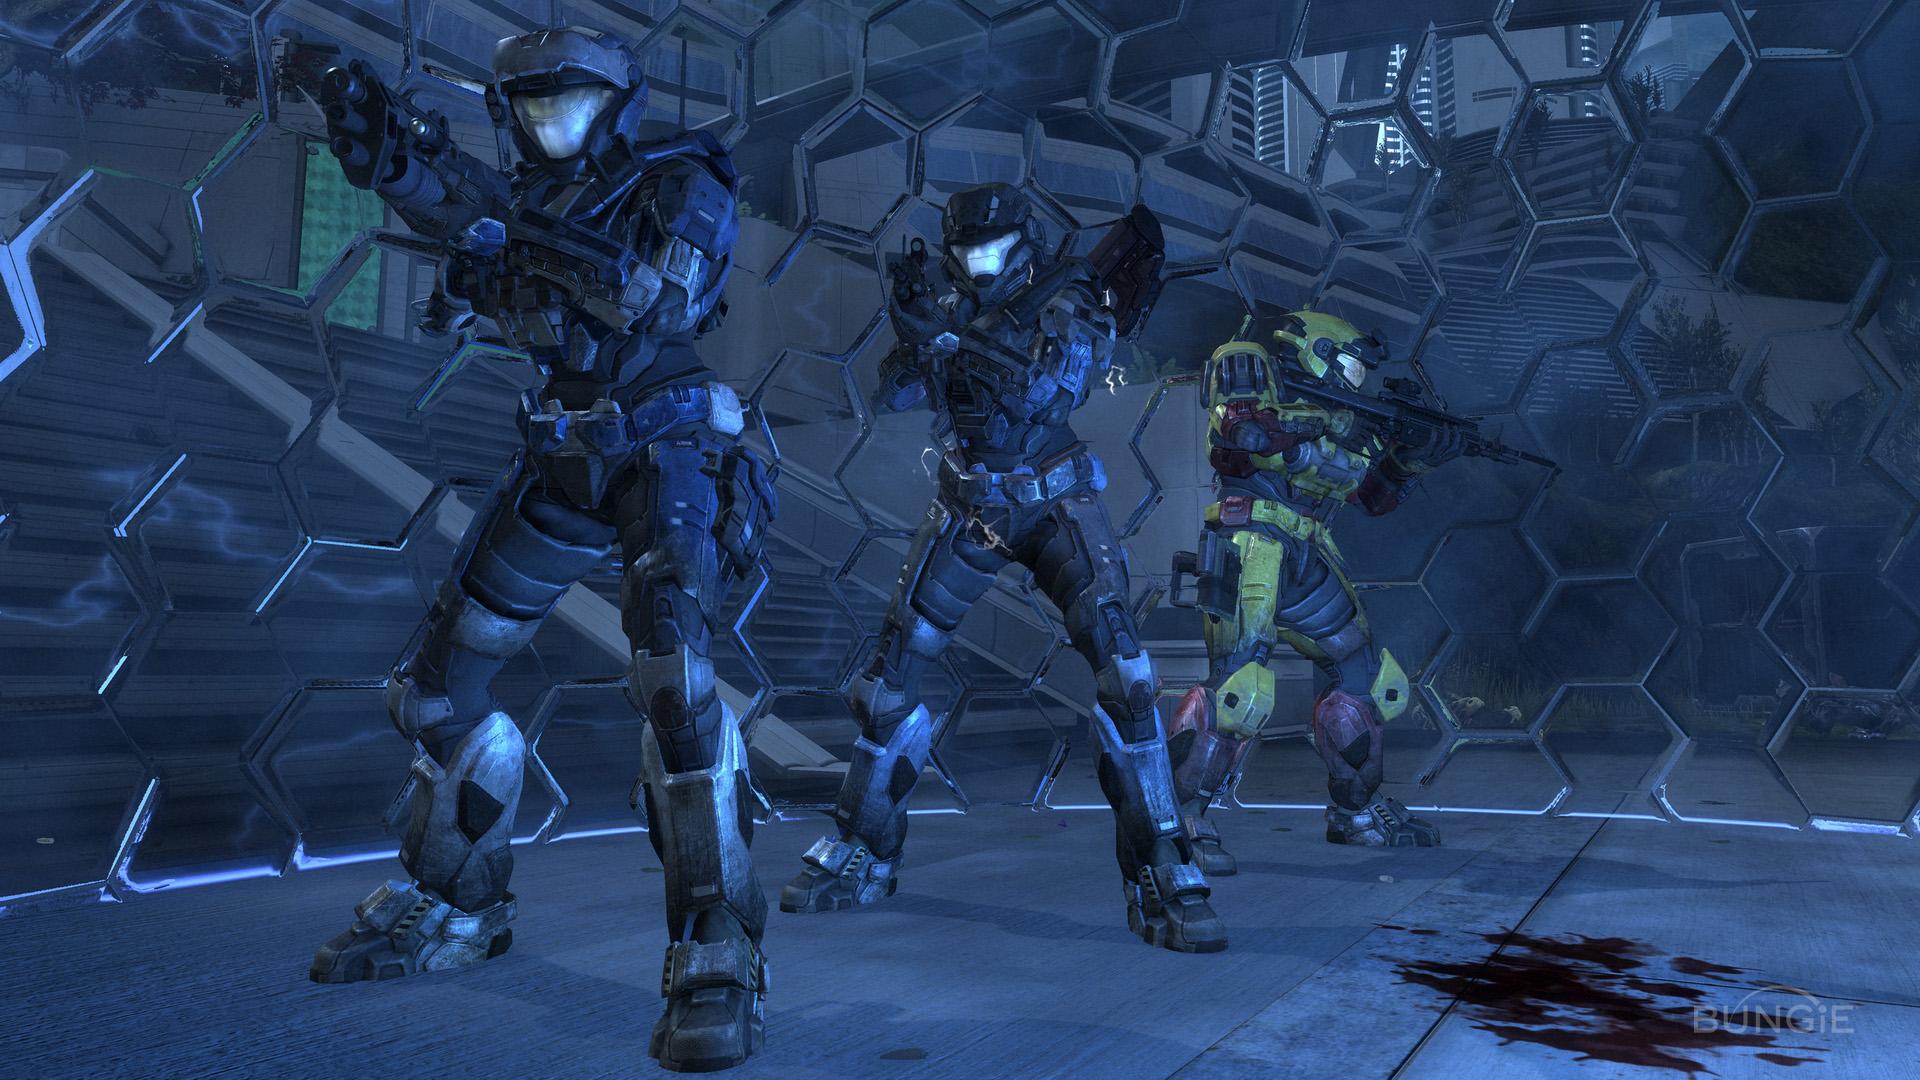 Halo combat evolved matchmaking